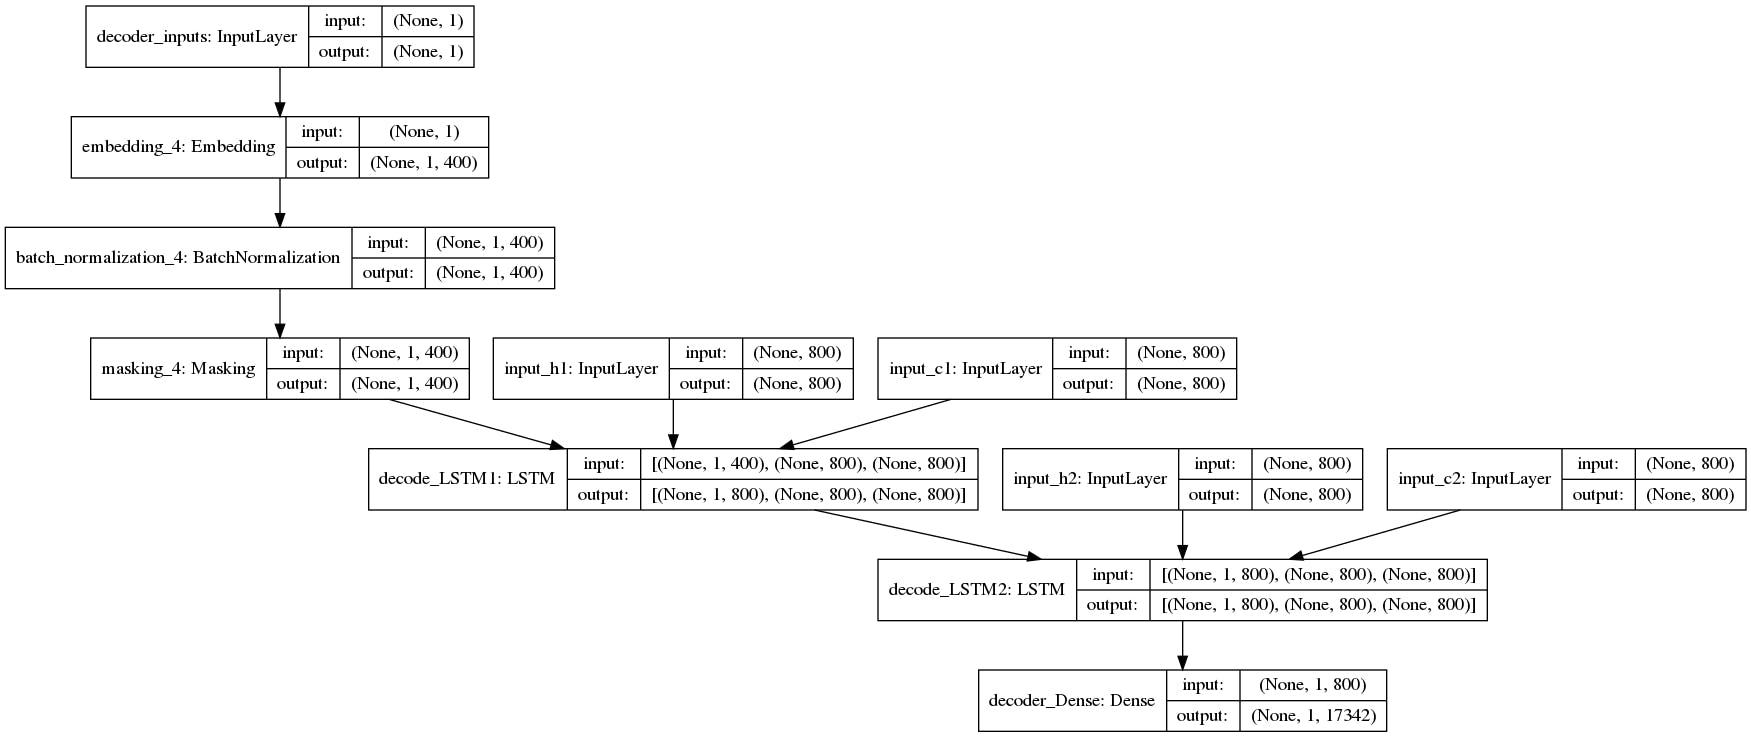 seq2seq021_decoder.png